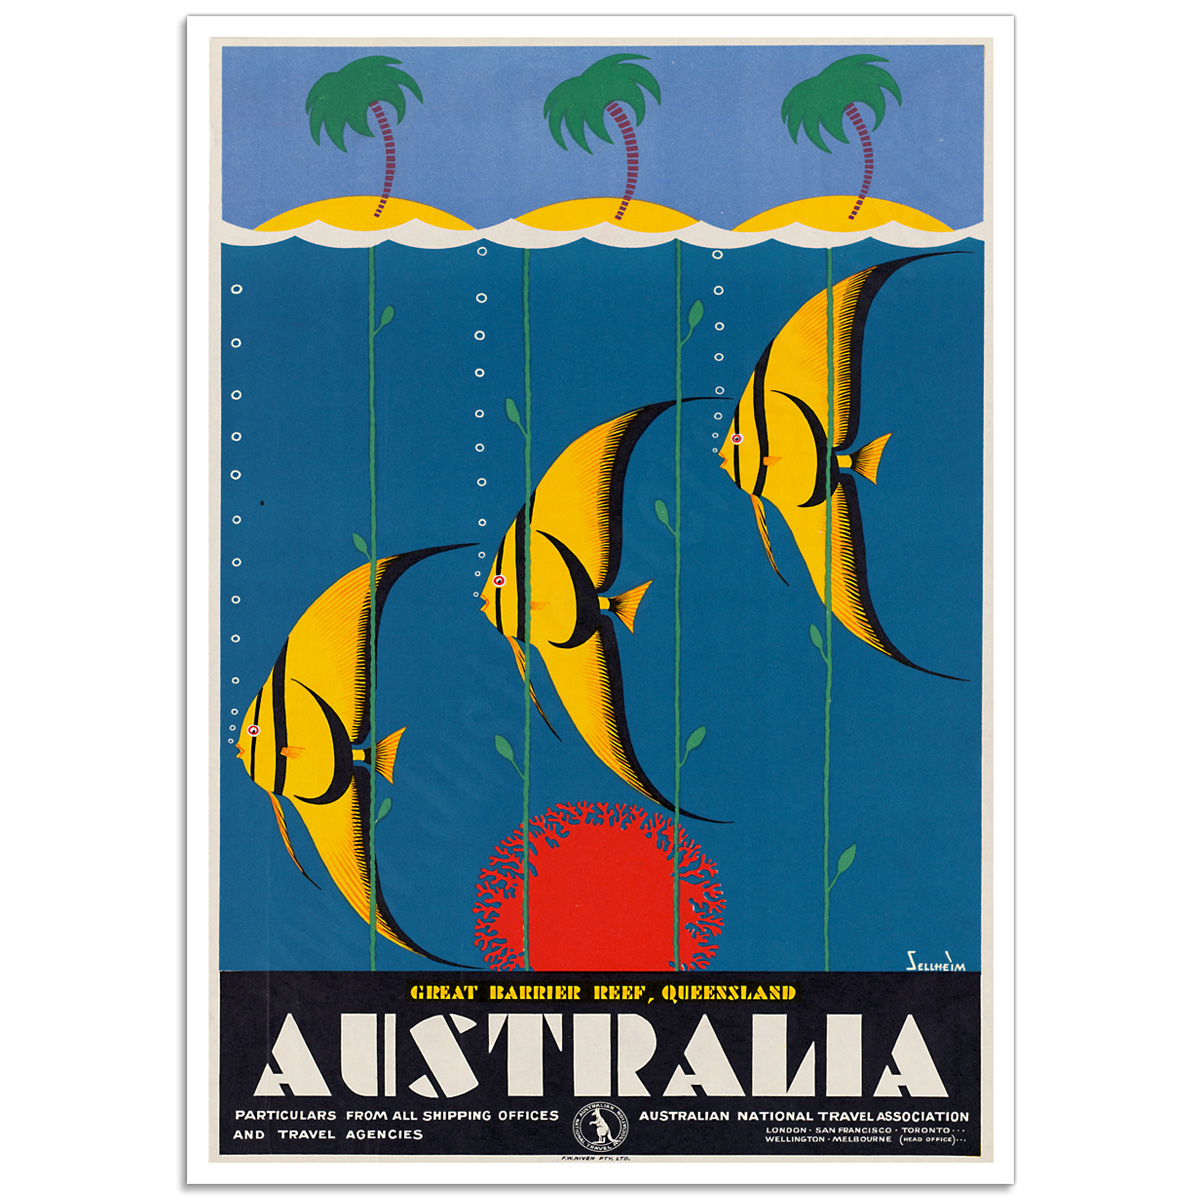 Vintage Travel Poster - Great Barrier Reef